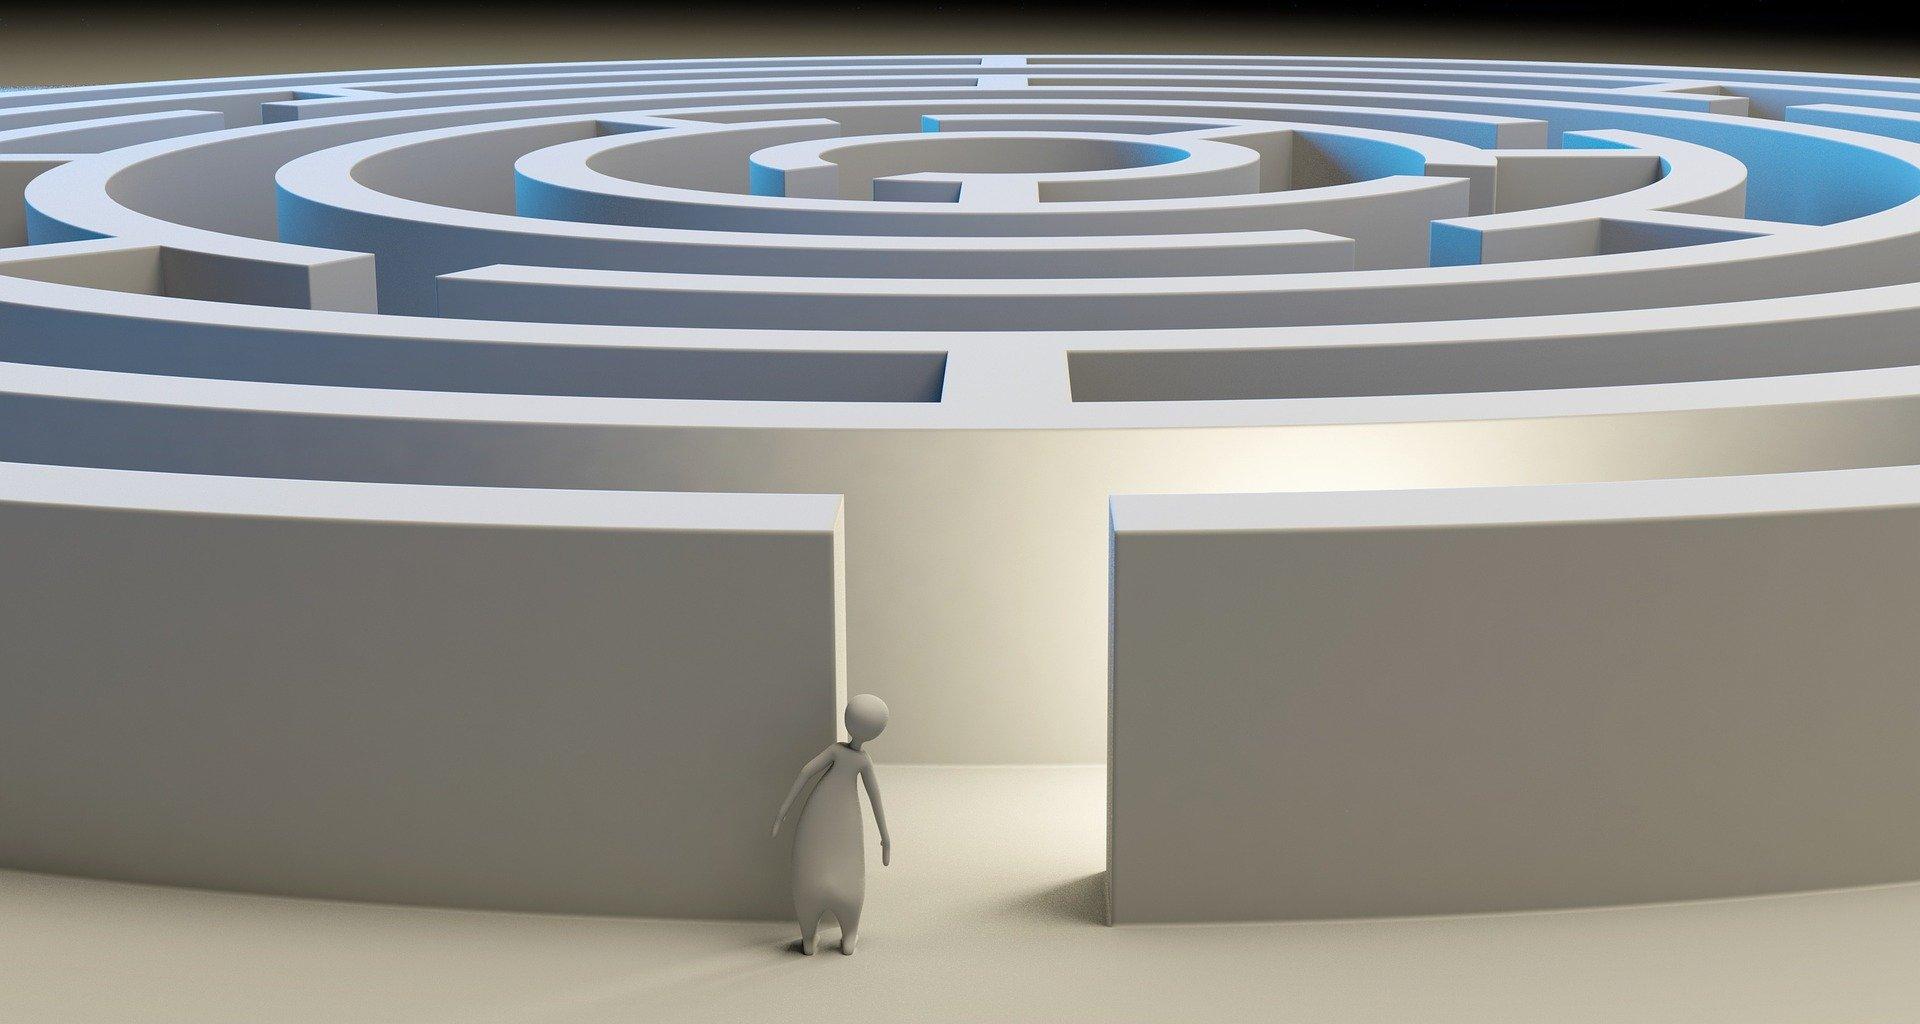 A maze representing common magazine UX issues